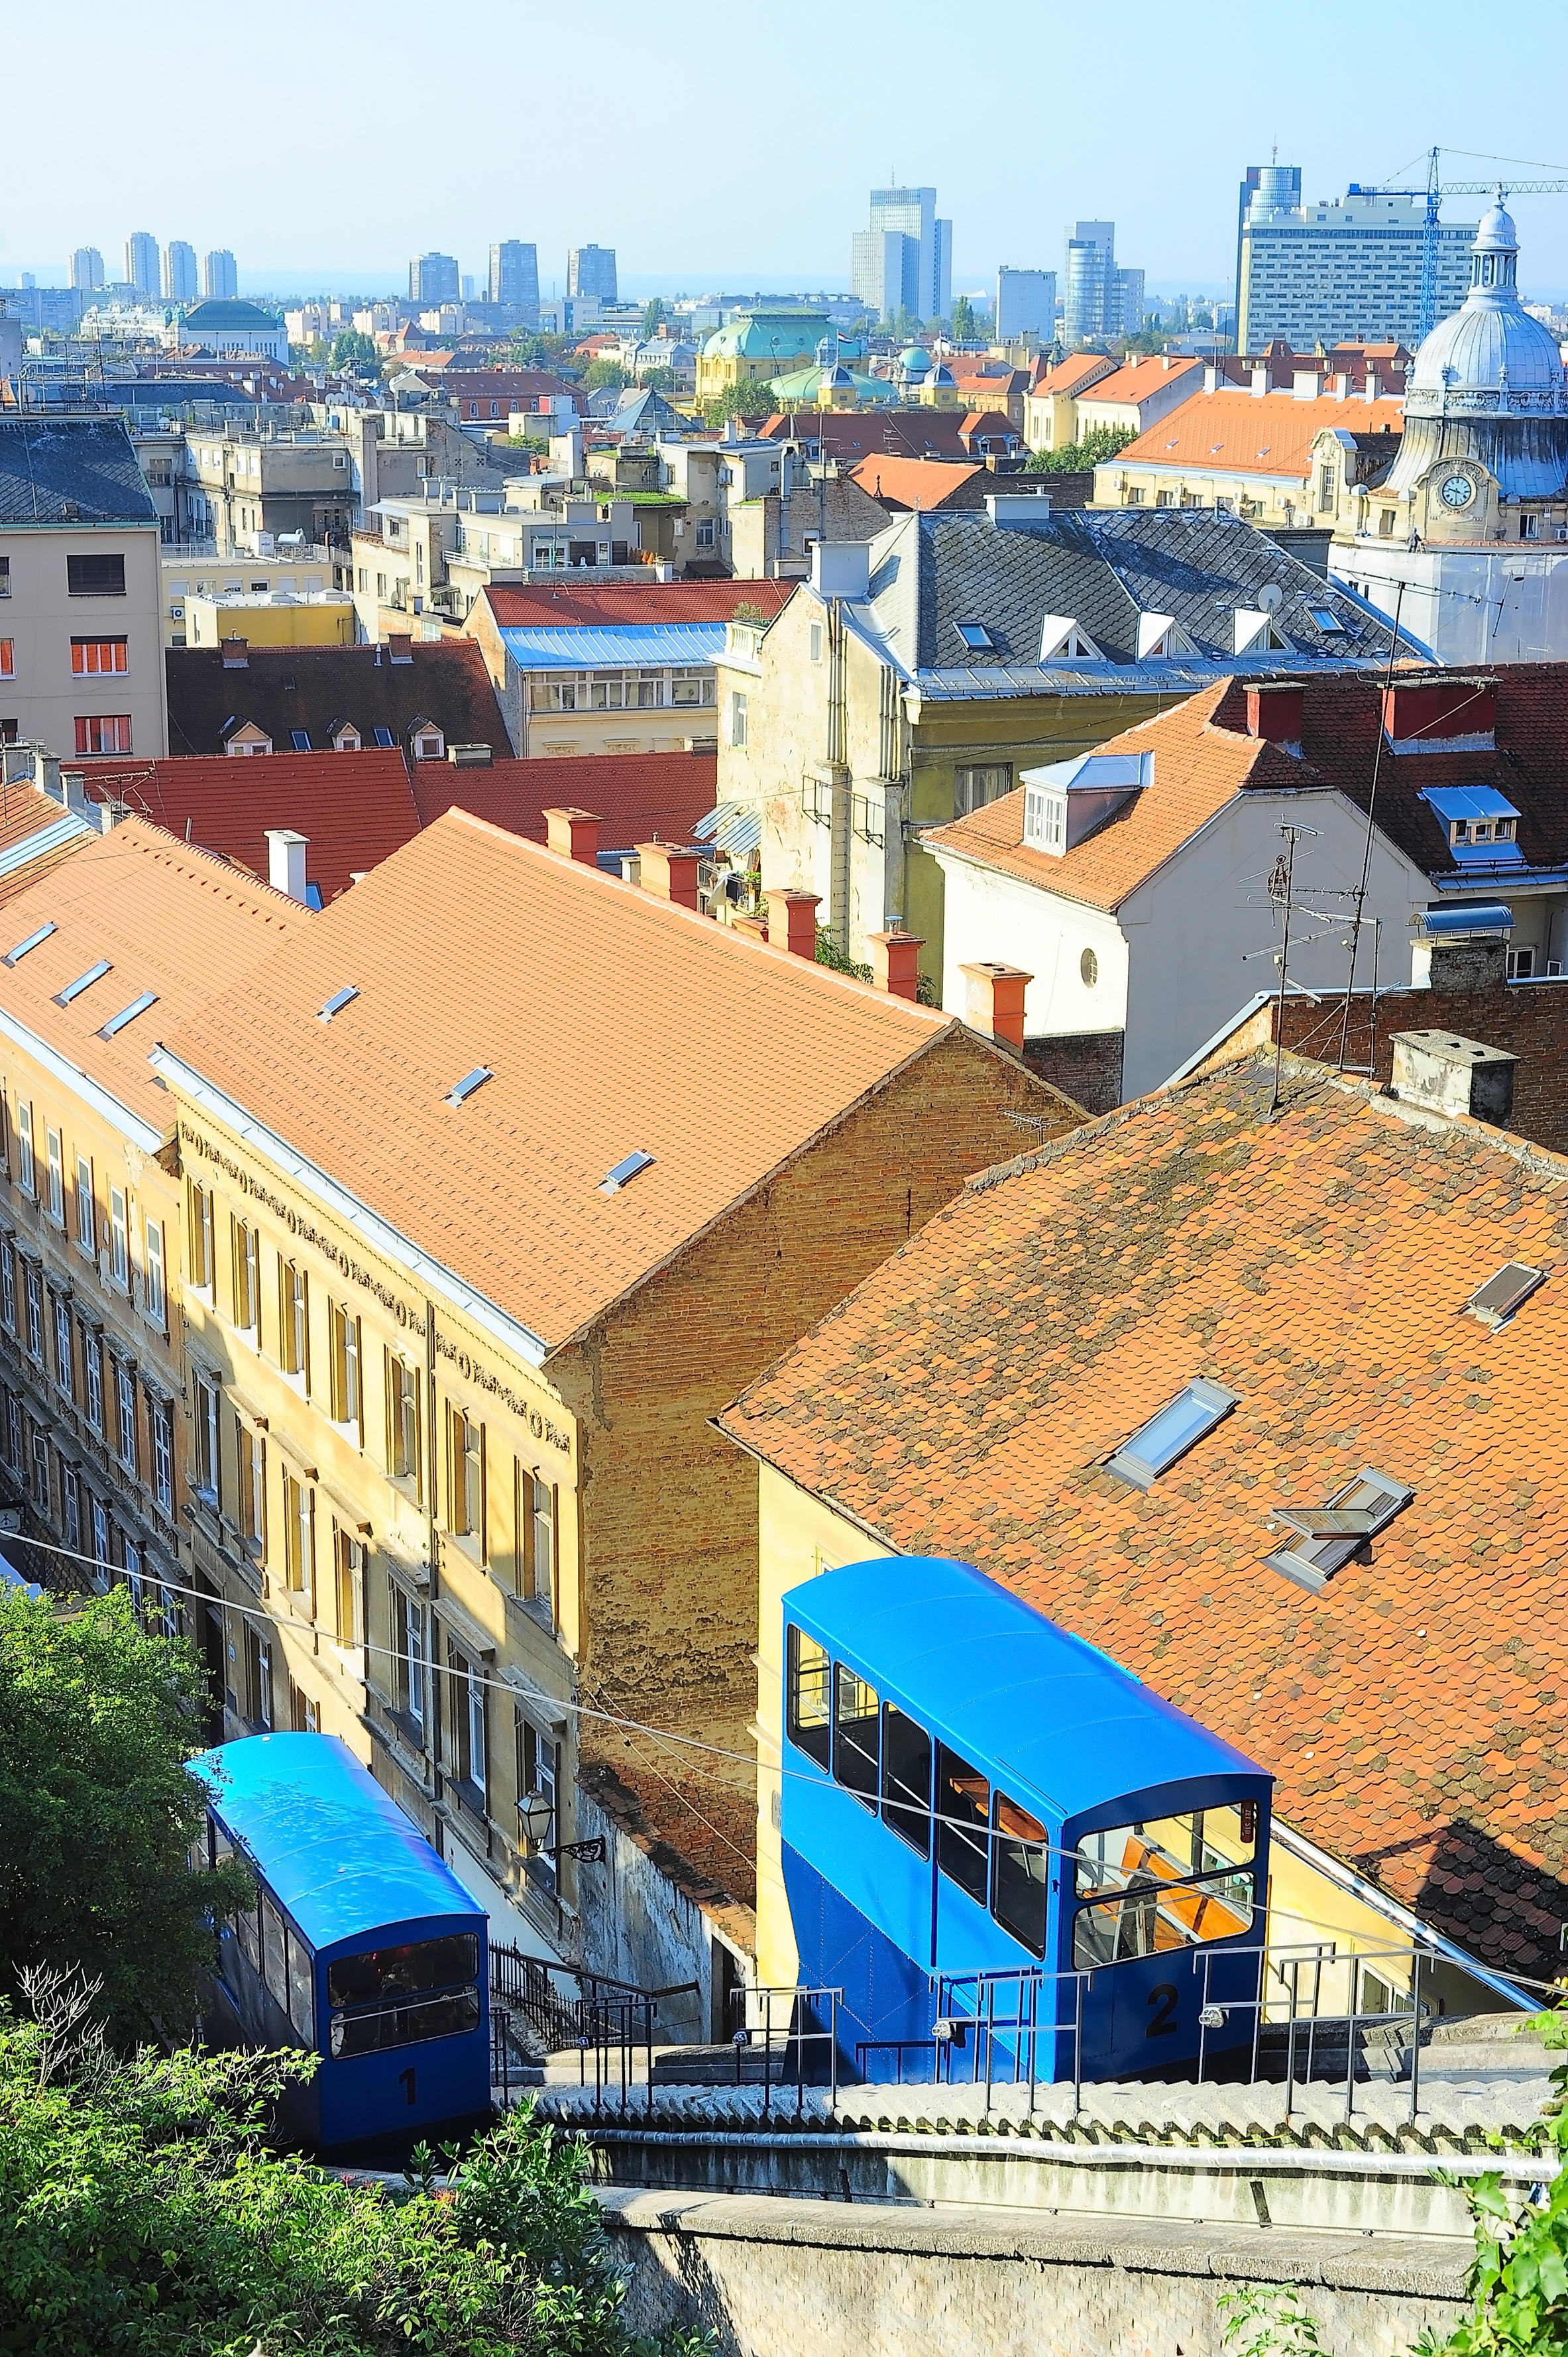 Zagreb hotline Employee Complaint